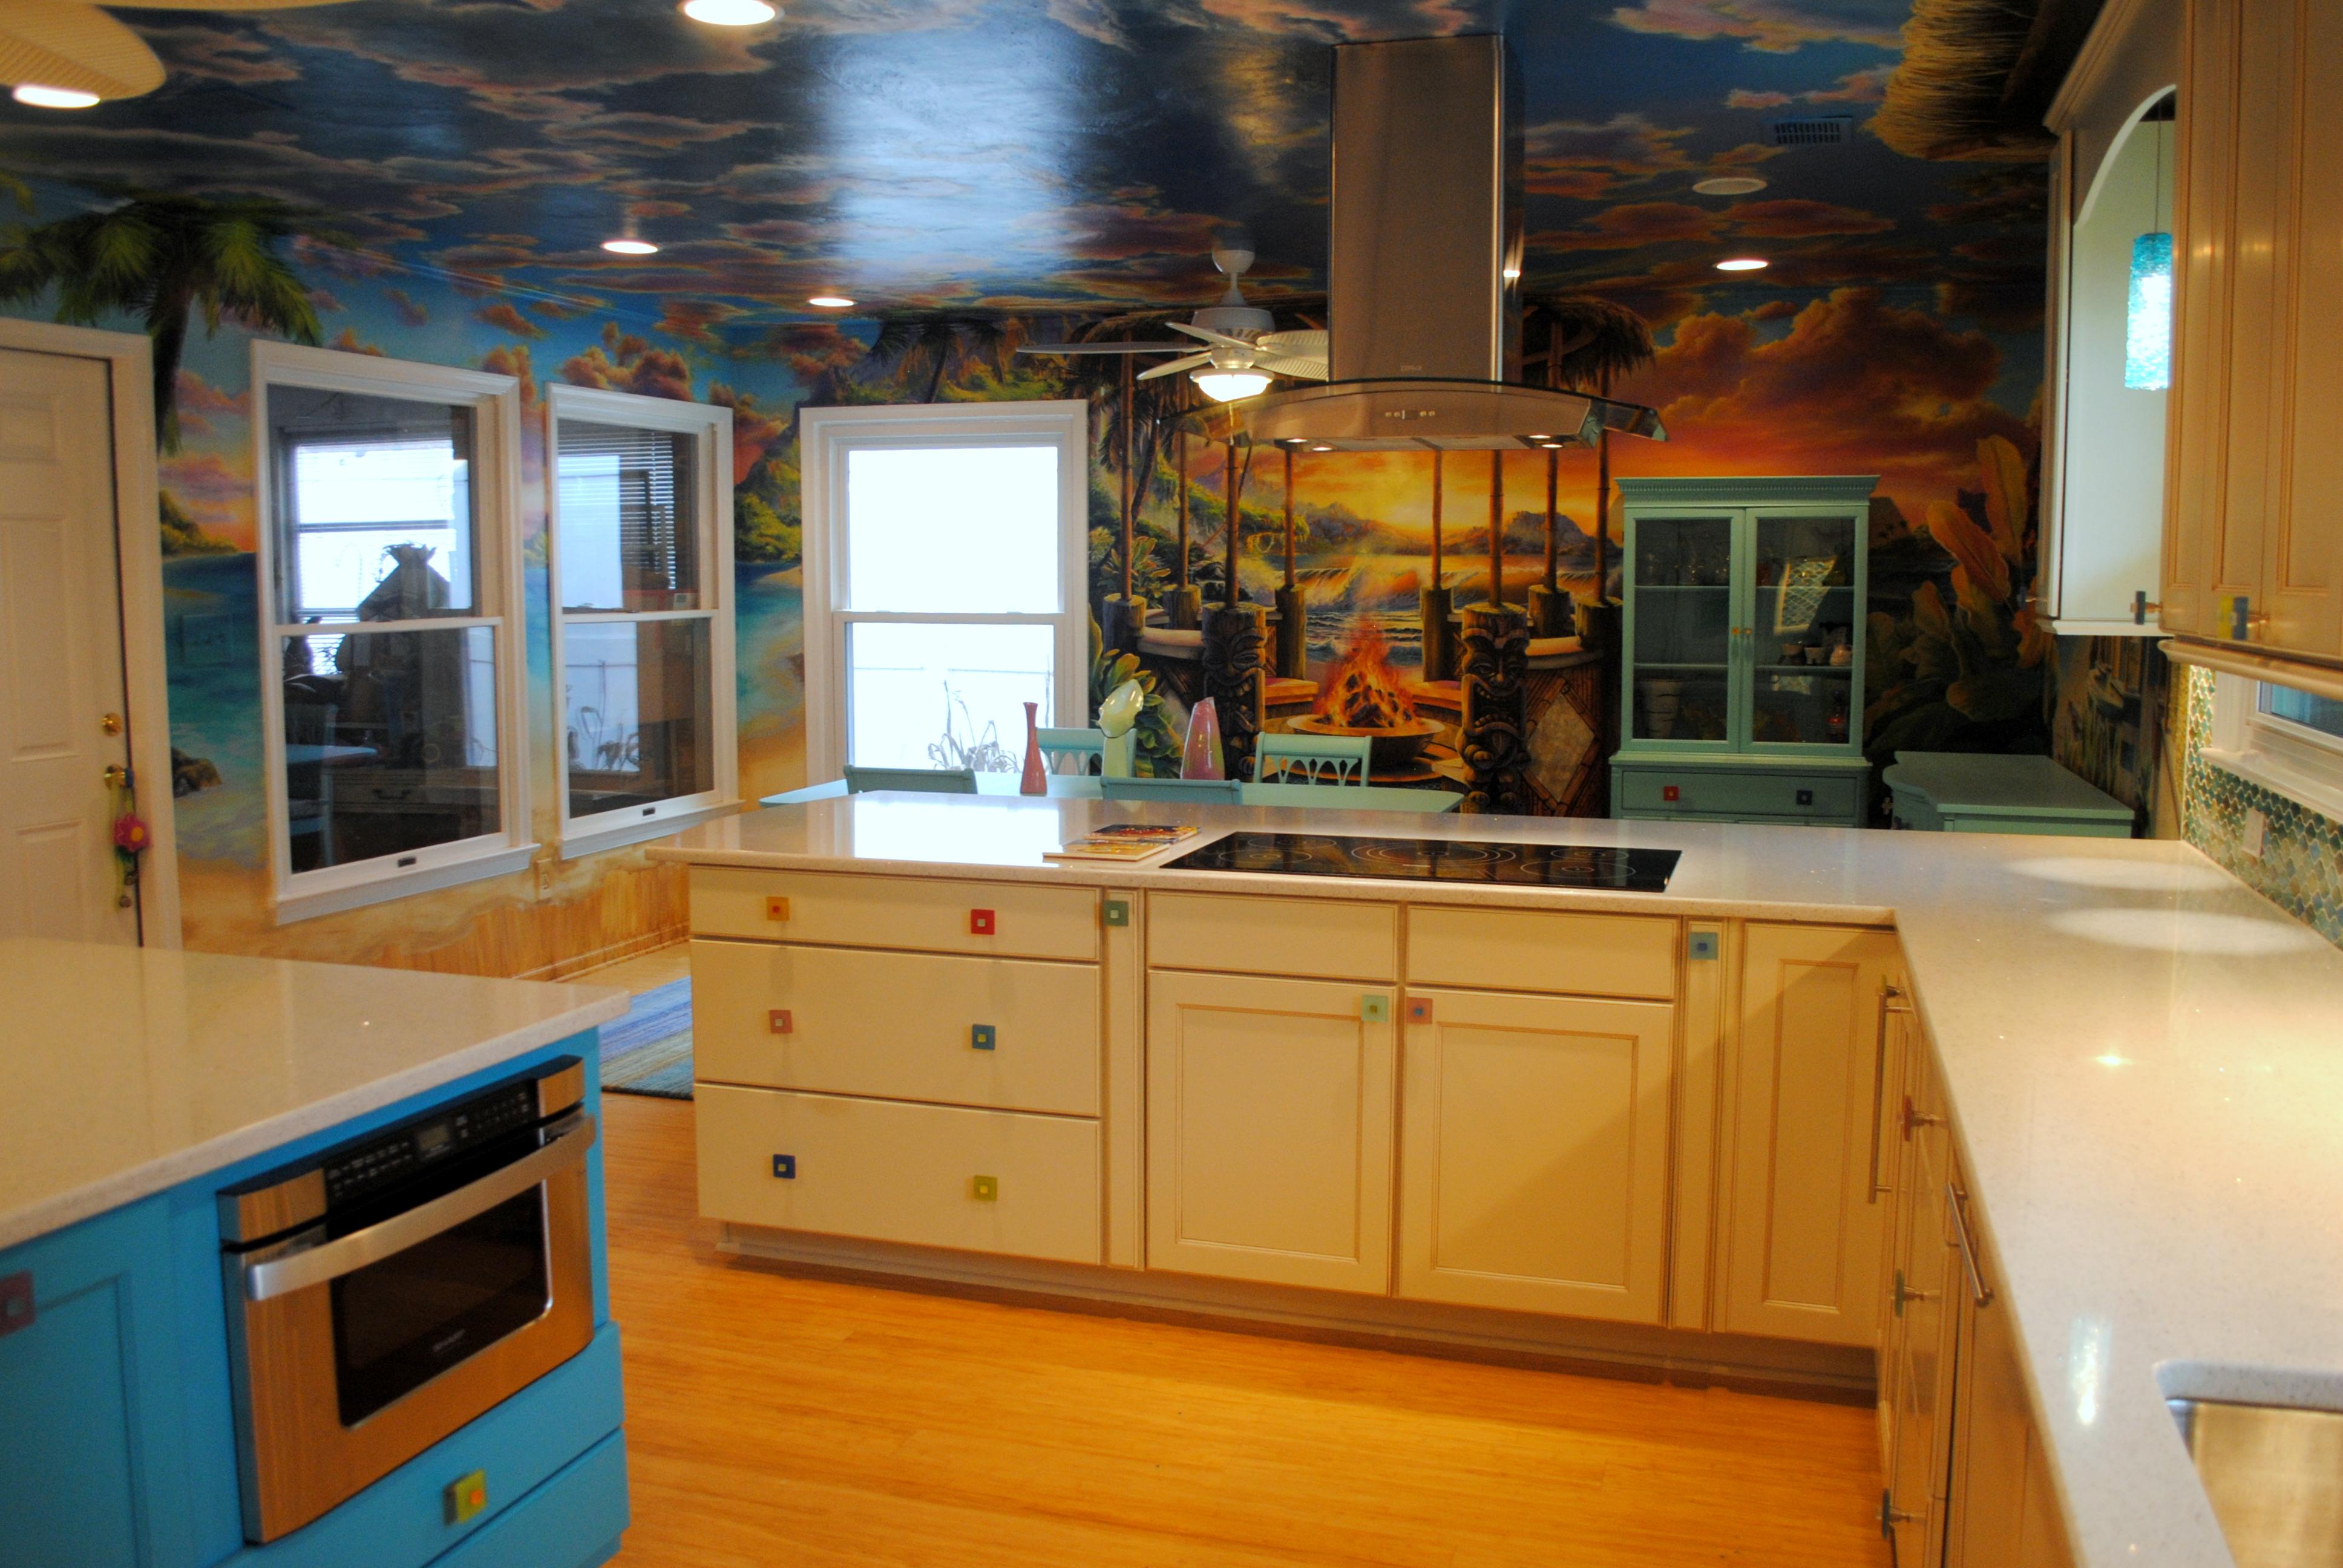 nkba 30 under 30 designer profile jessica altman kitchen remodel hawaii Hawaiian themed kitchen designed by Jessica Altman